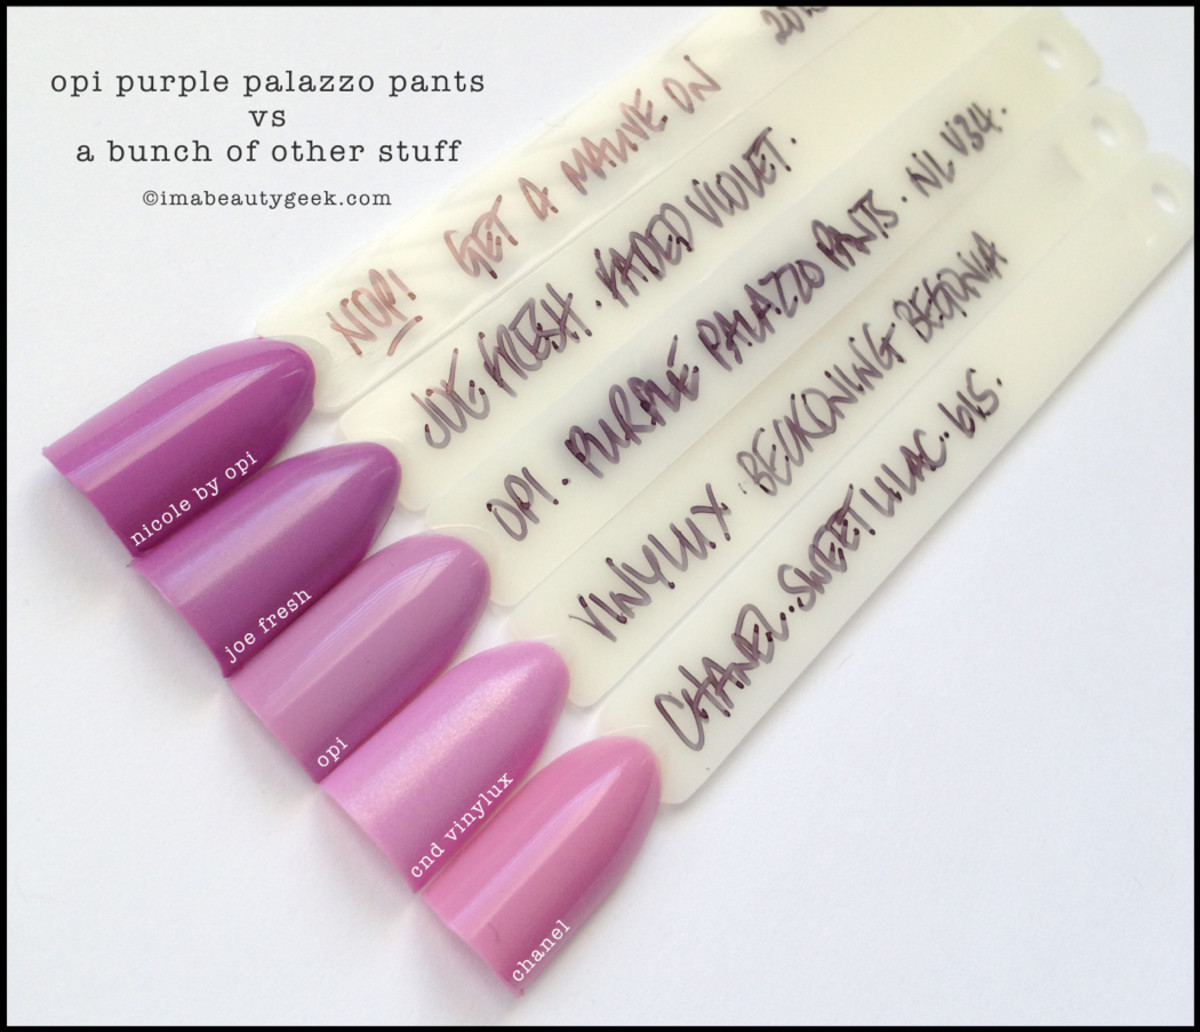 OPI Purple Palazzo Pants Comparison Swatches OPI Venice 2015